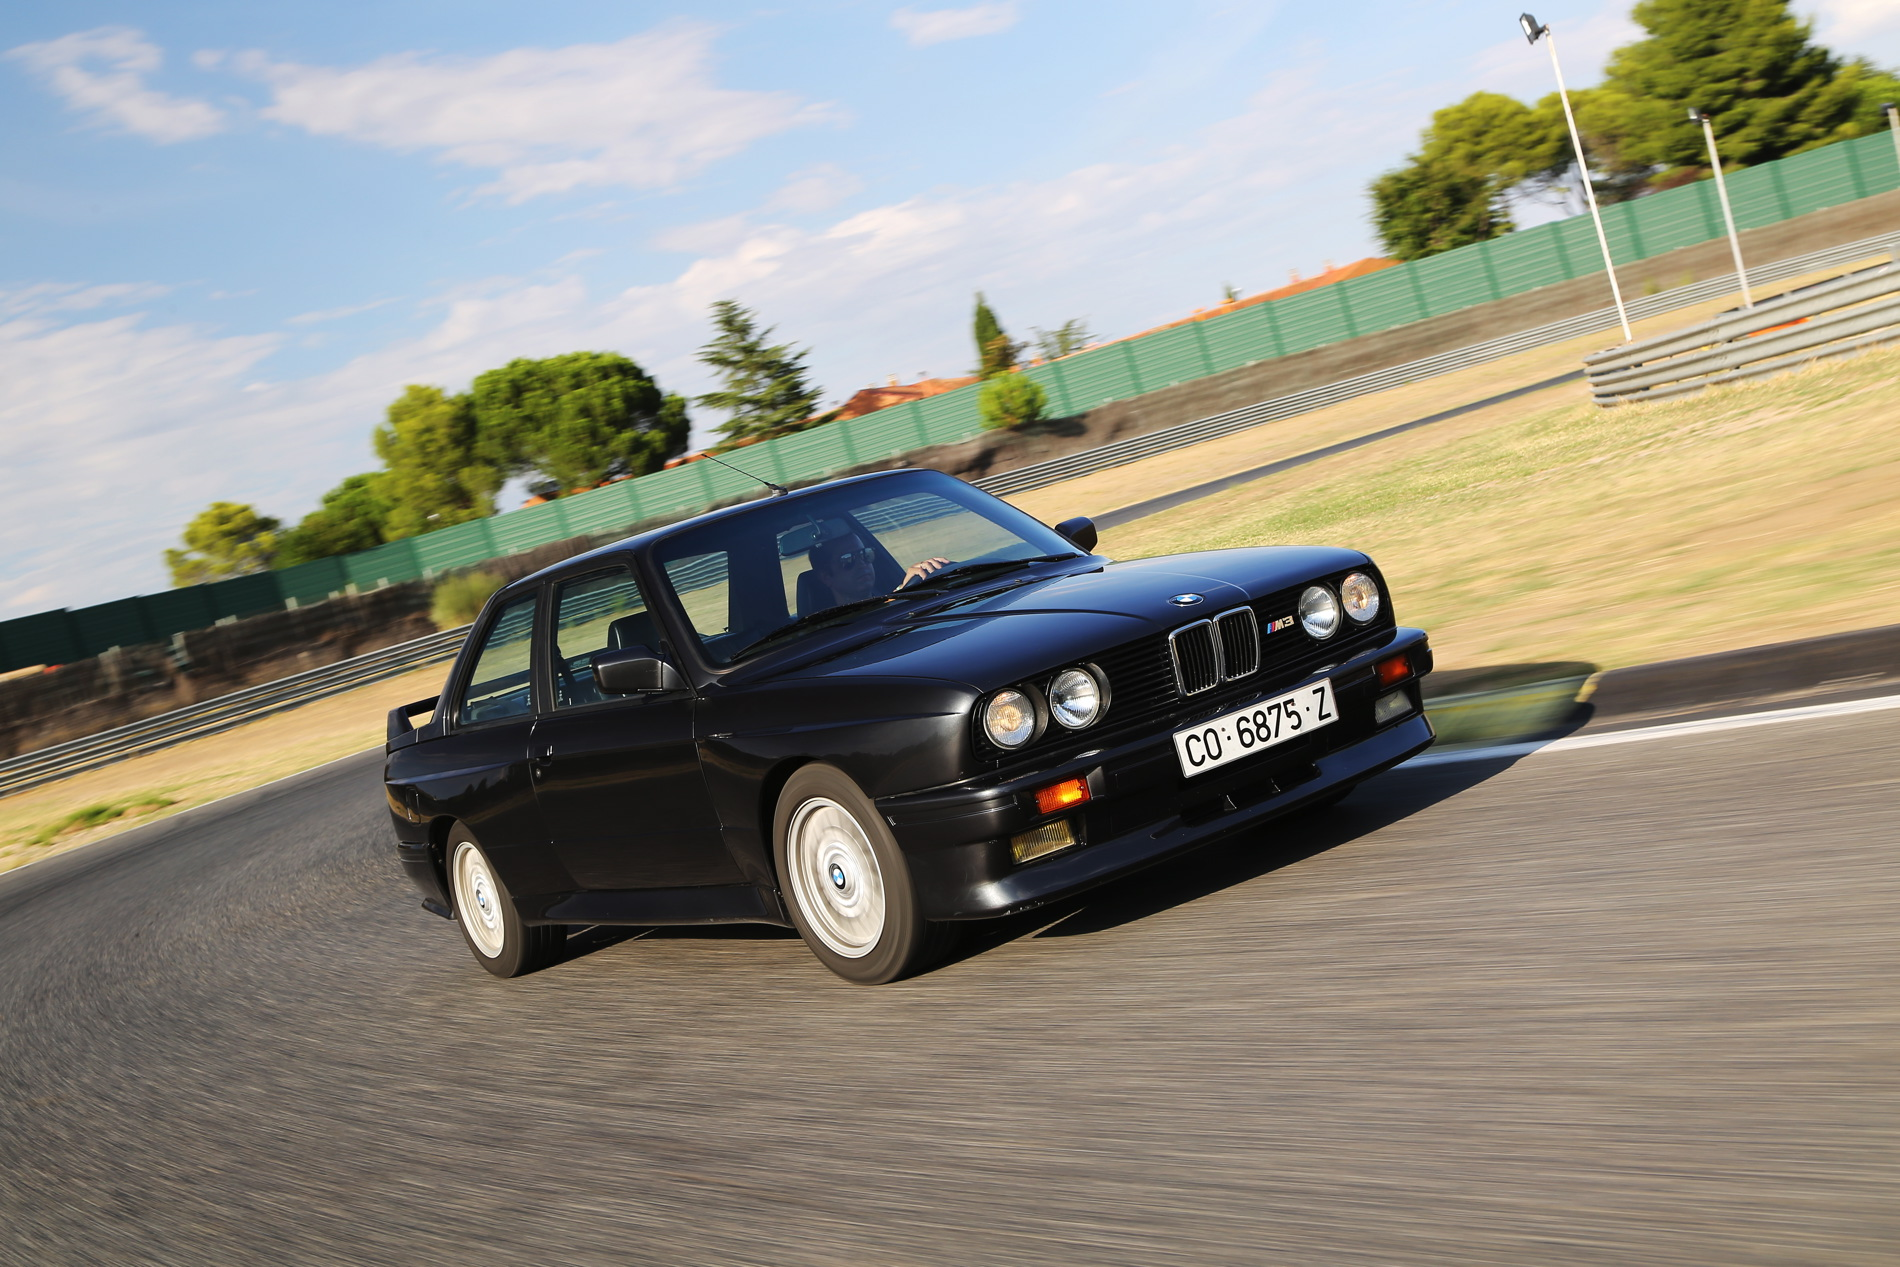 BMW M3 E30 photos 6